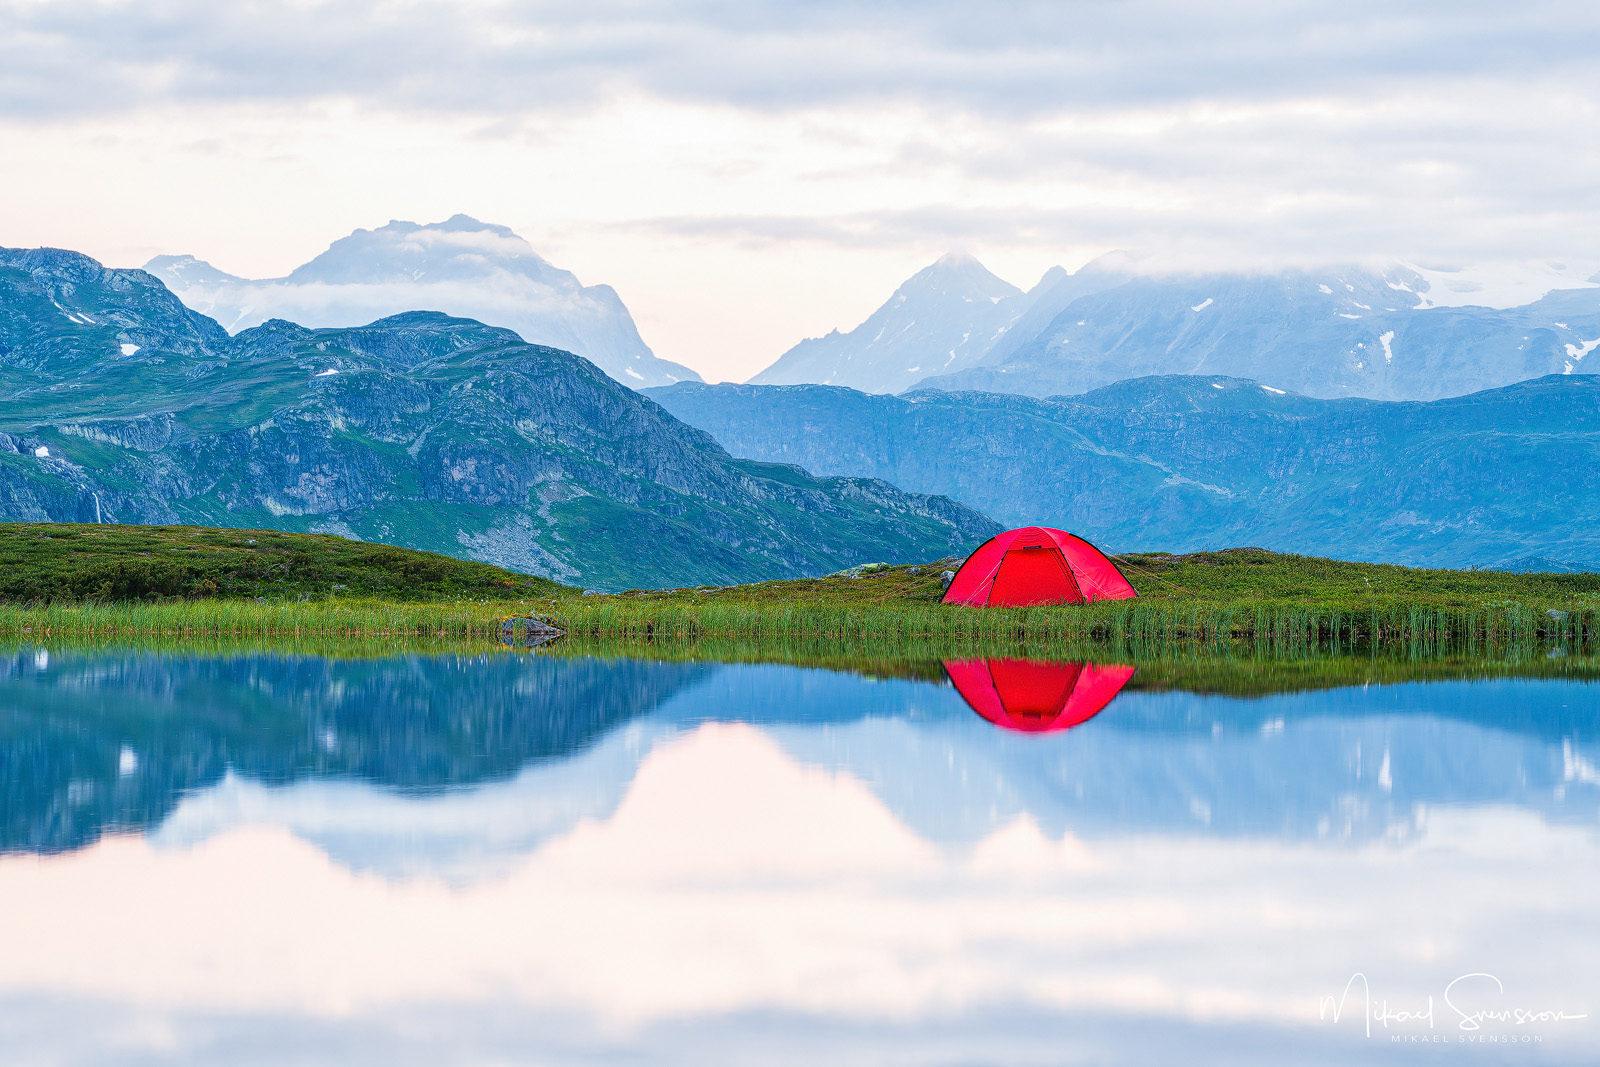 Tältning på Slettefjell, Norge. Foto: Mikael Svensson, www.mikaelsvensson.com